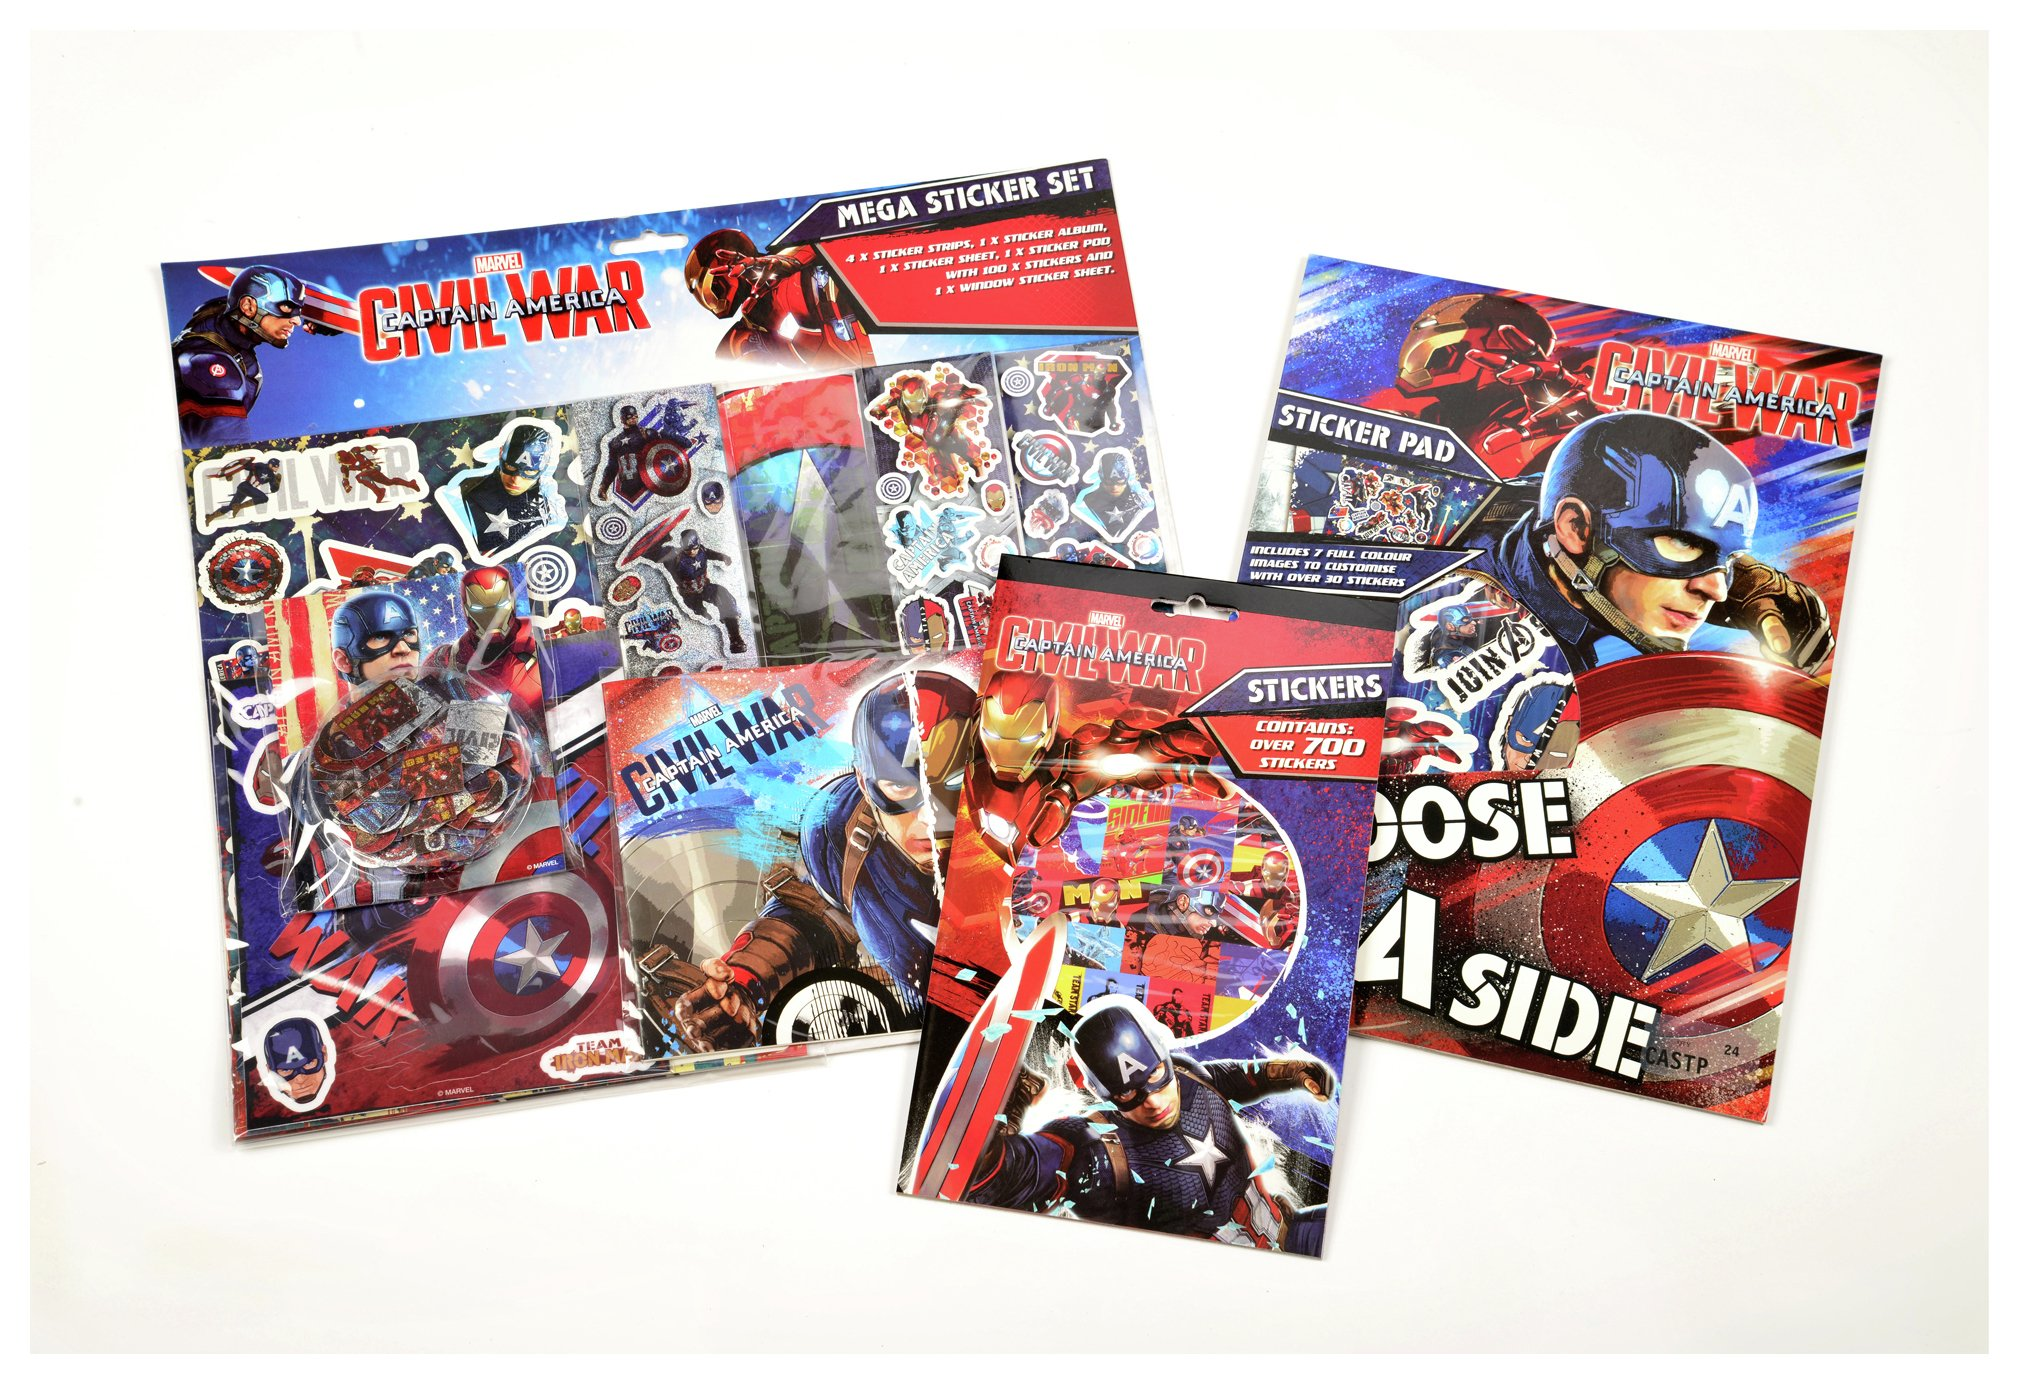 Image of Captain America Sticker Bundle.